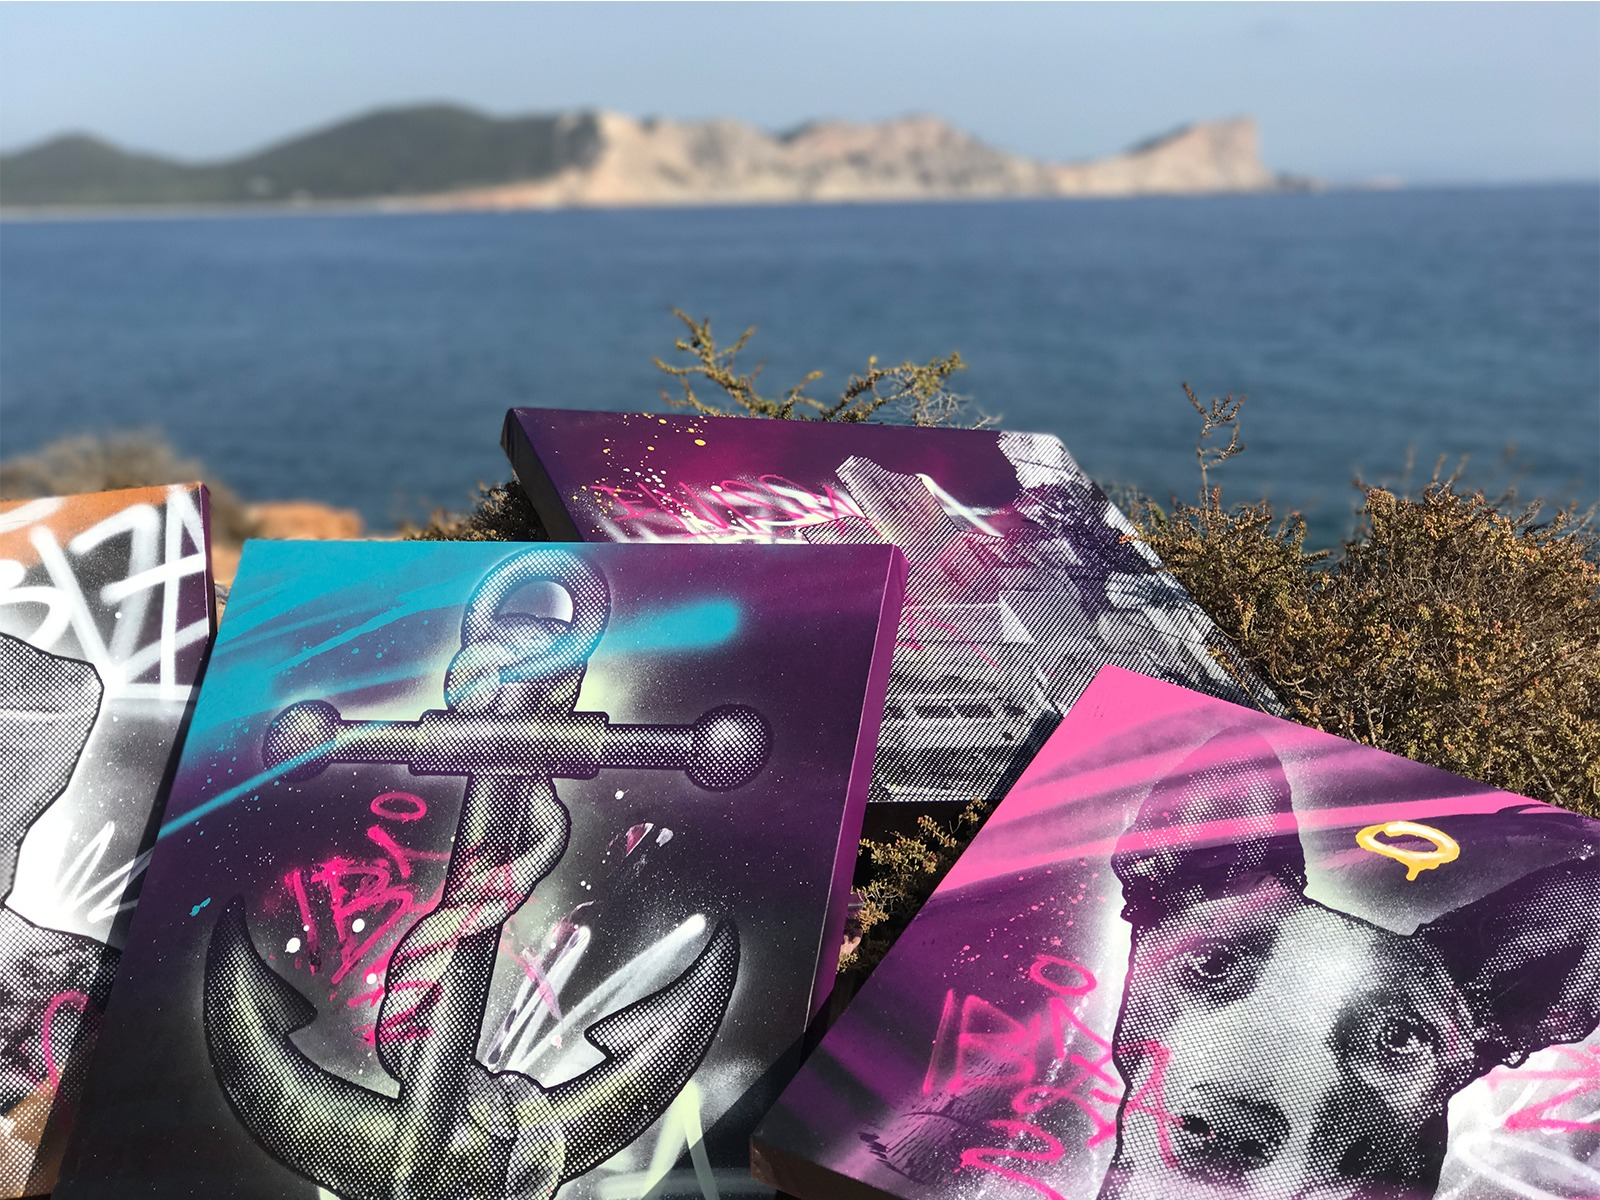 graffitiauftrag-graffitikuenstler-artmos4-graffiti-artist-ibiza-bfree-canvas